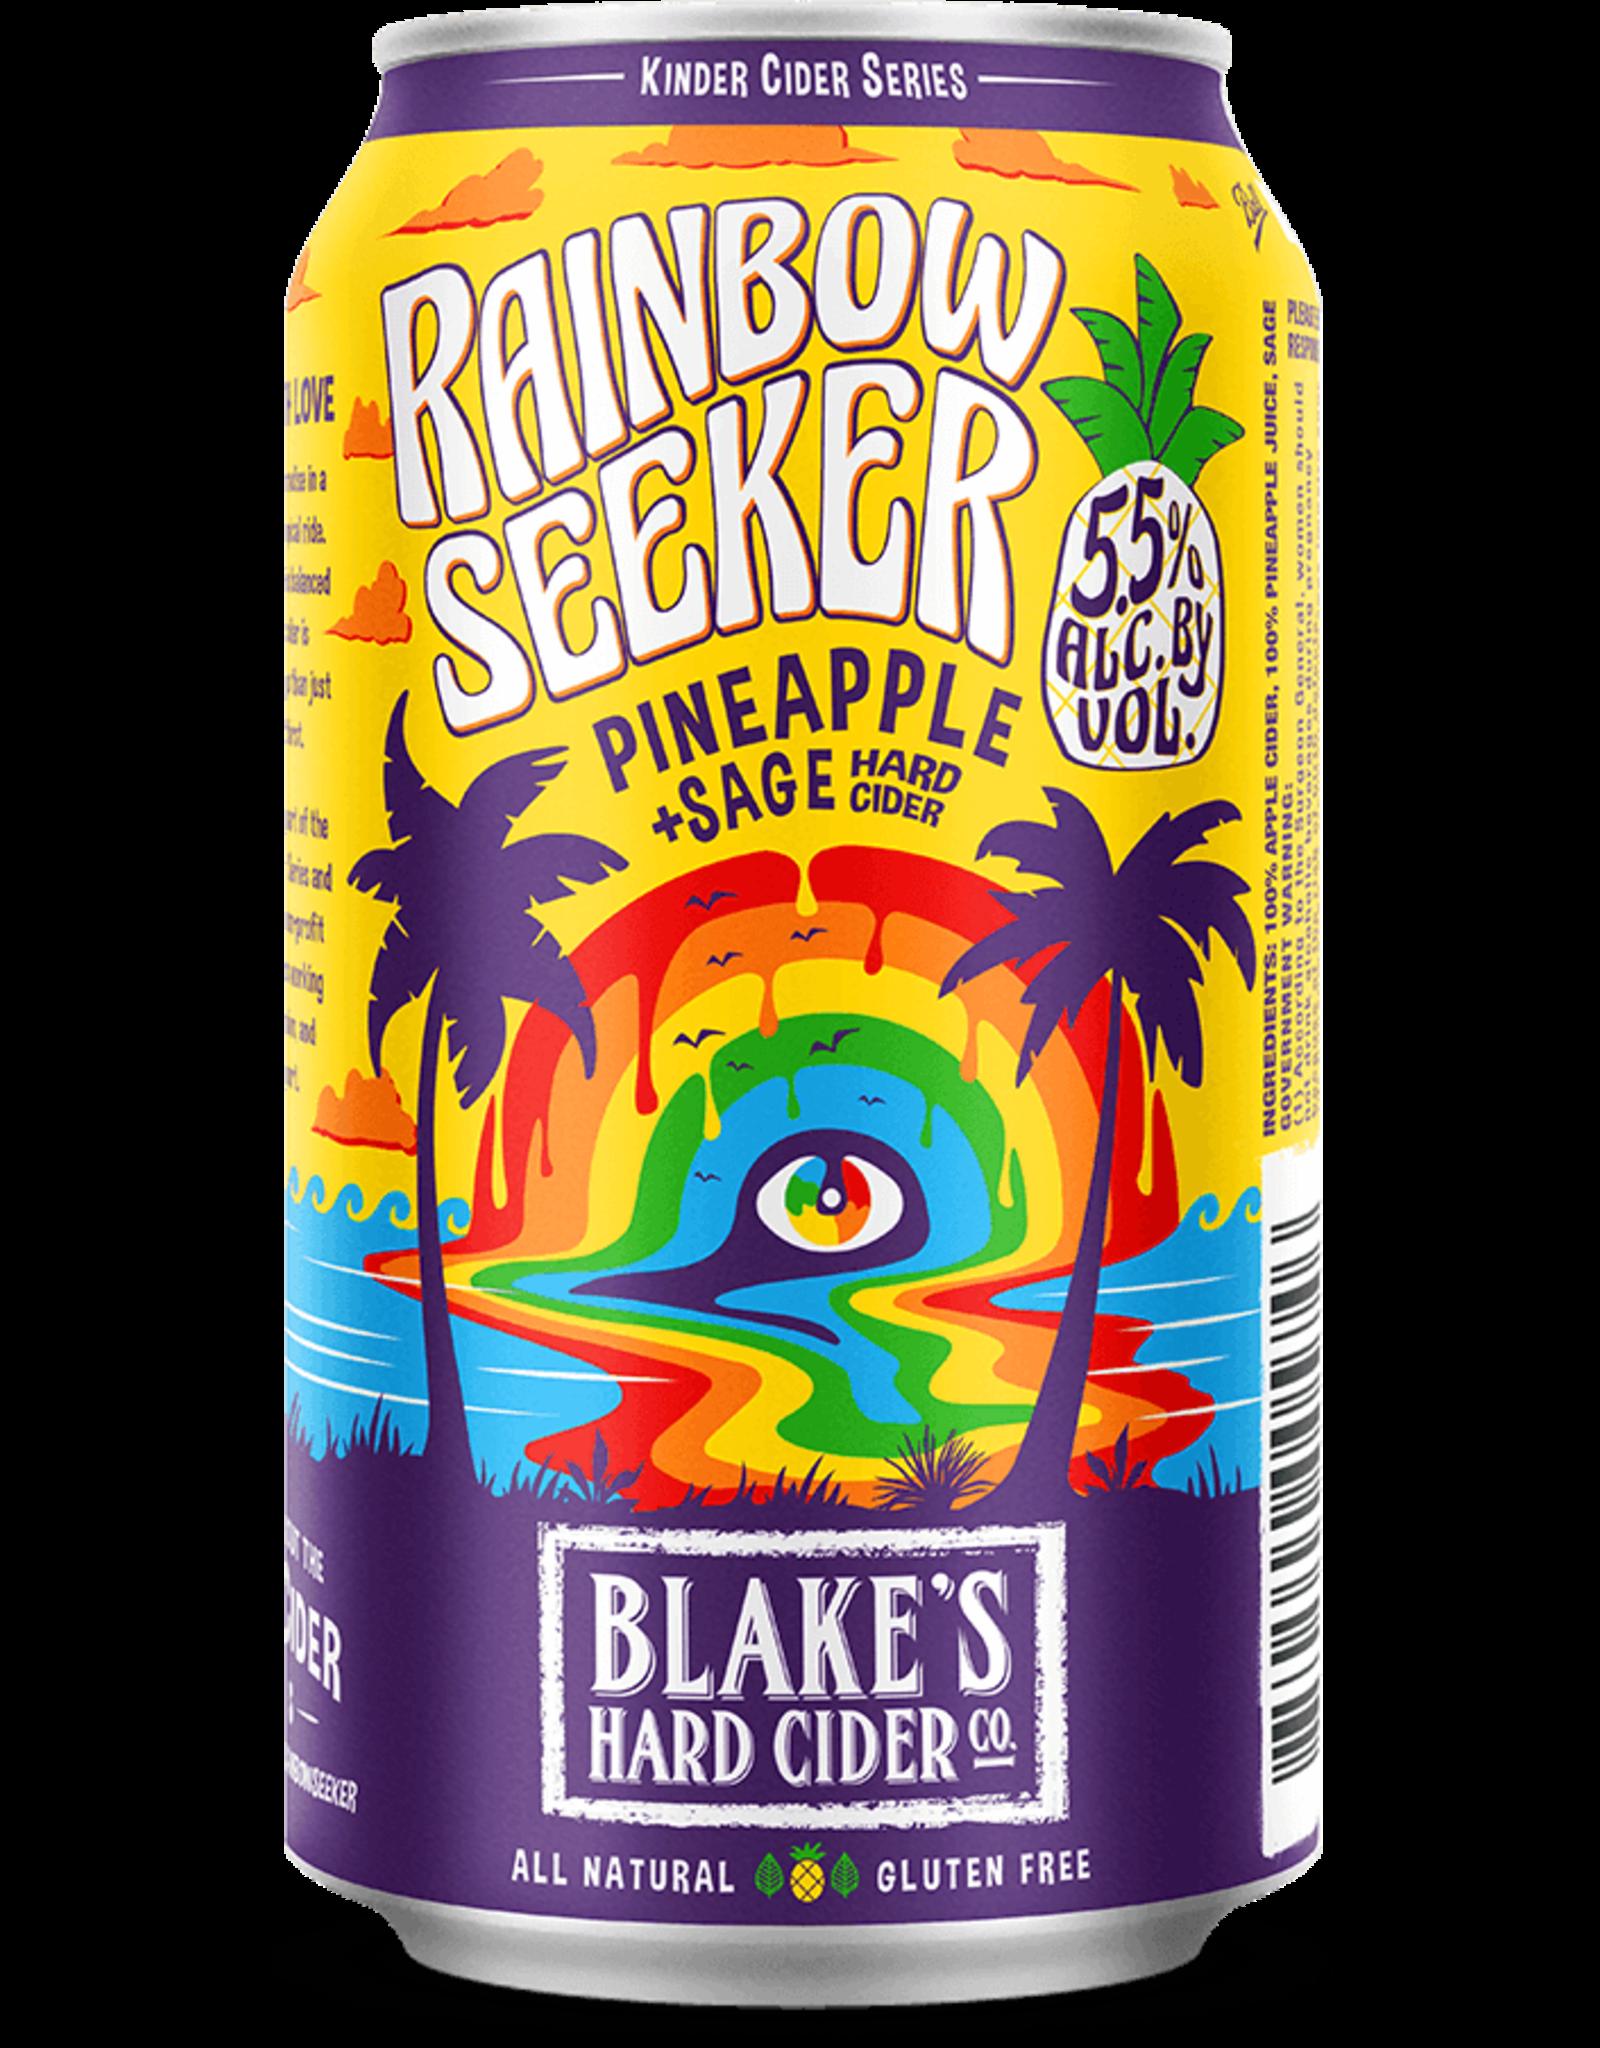 Blake's Blake's Hard Cider, Rainbow Seeker Pineapple